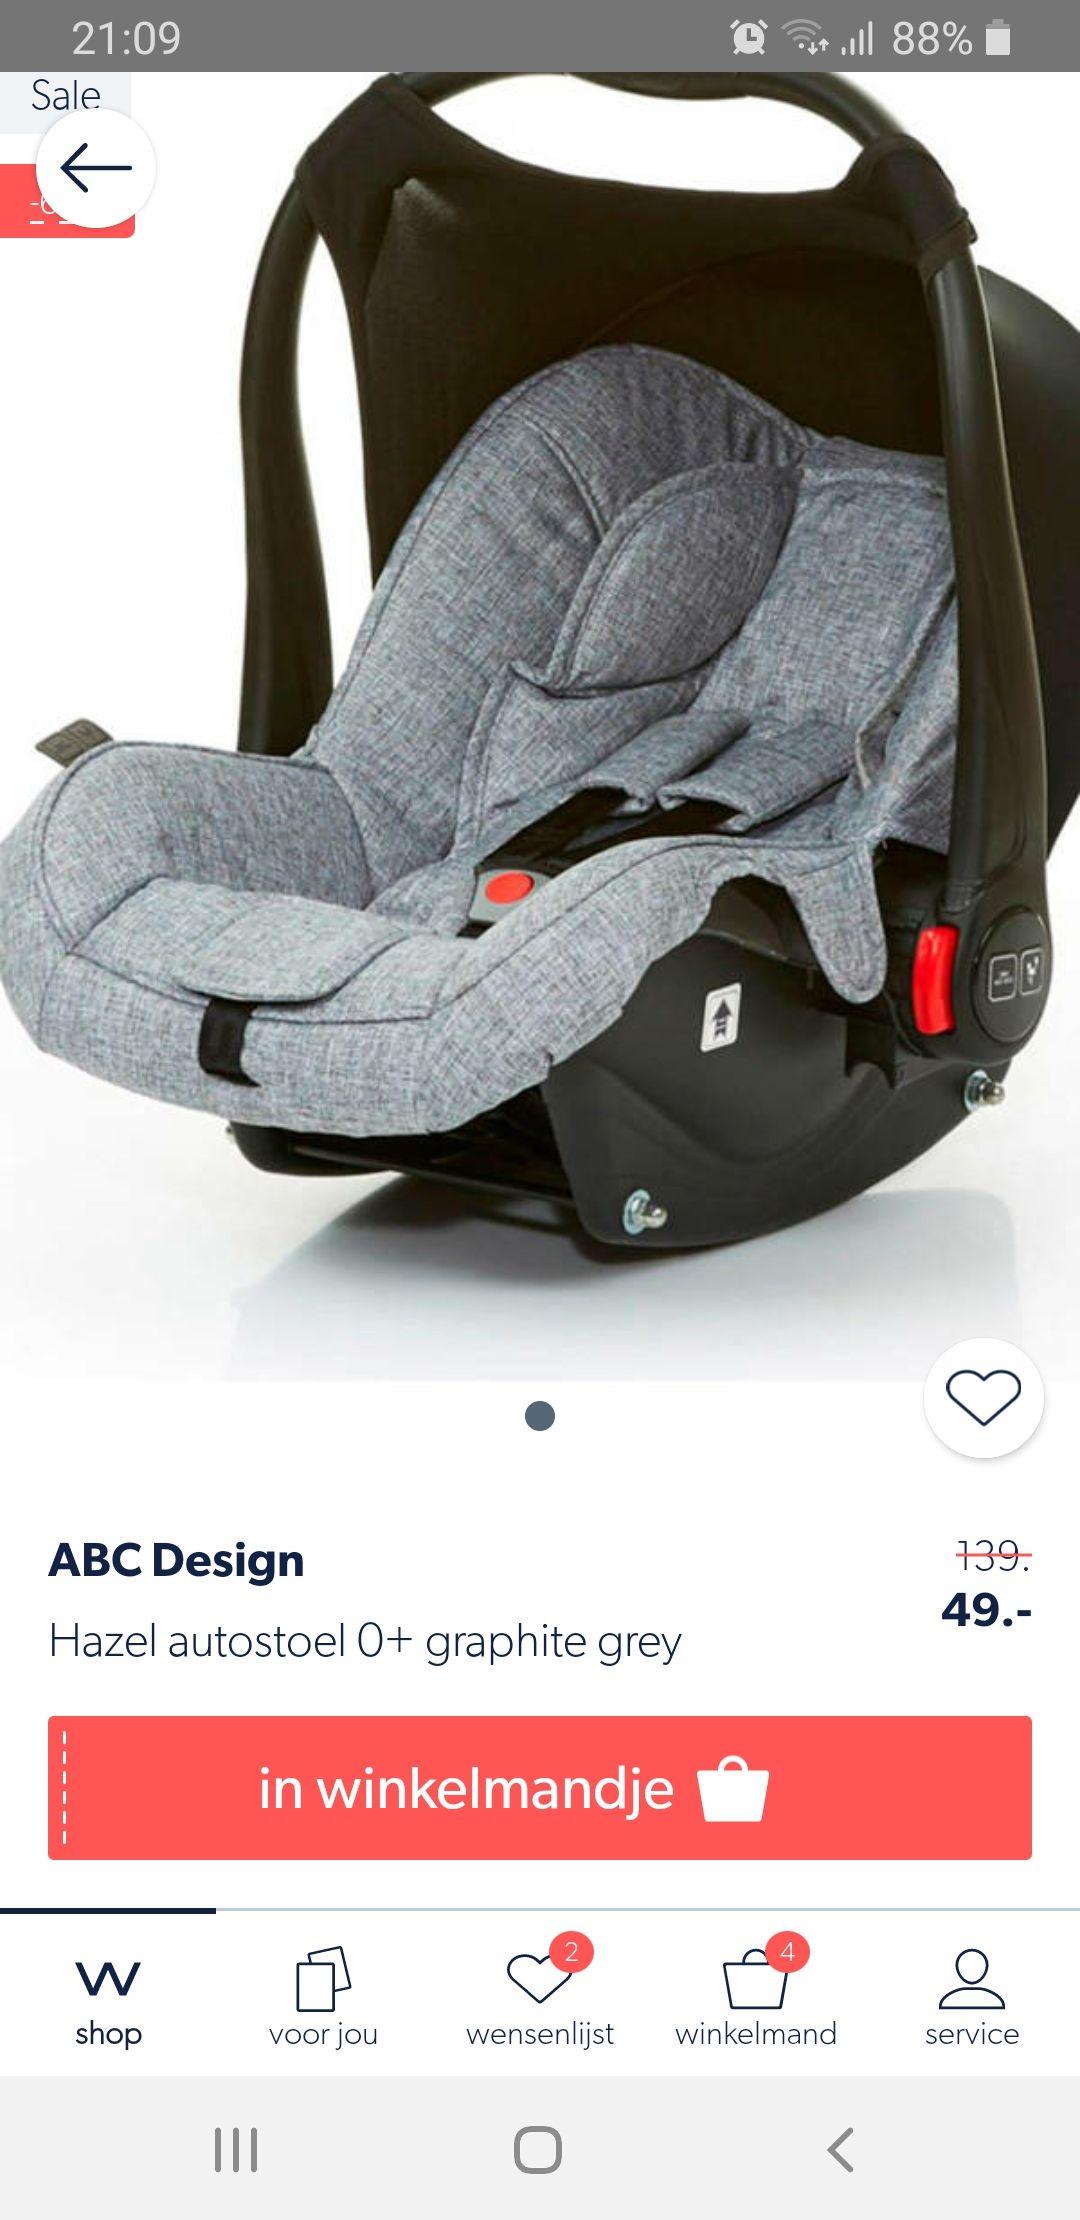 ABC Design 0+ graphite grey